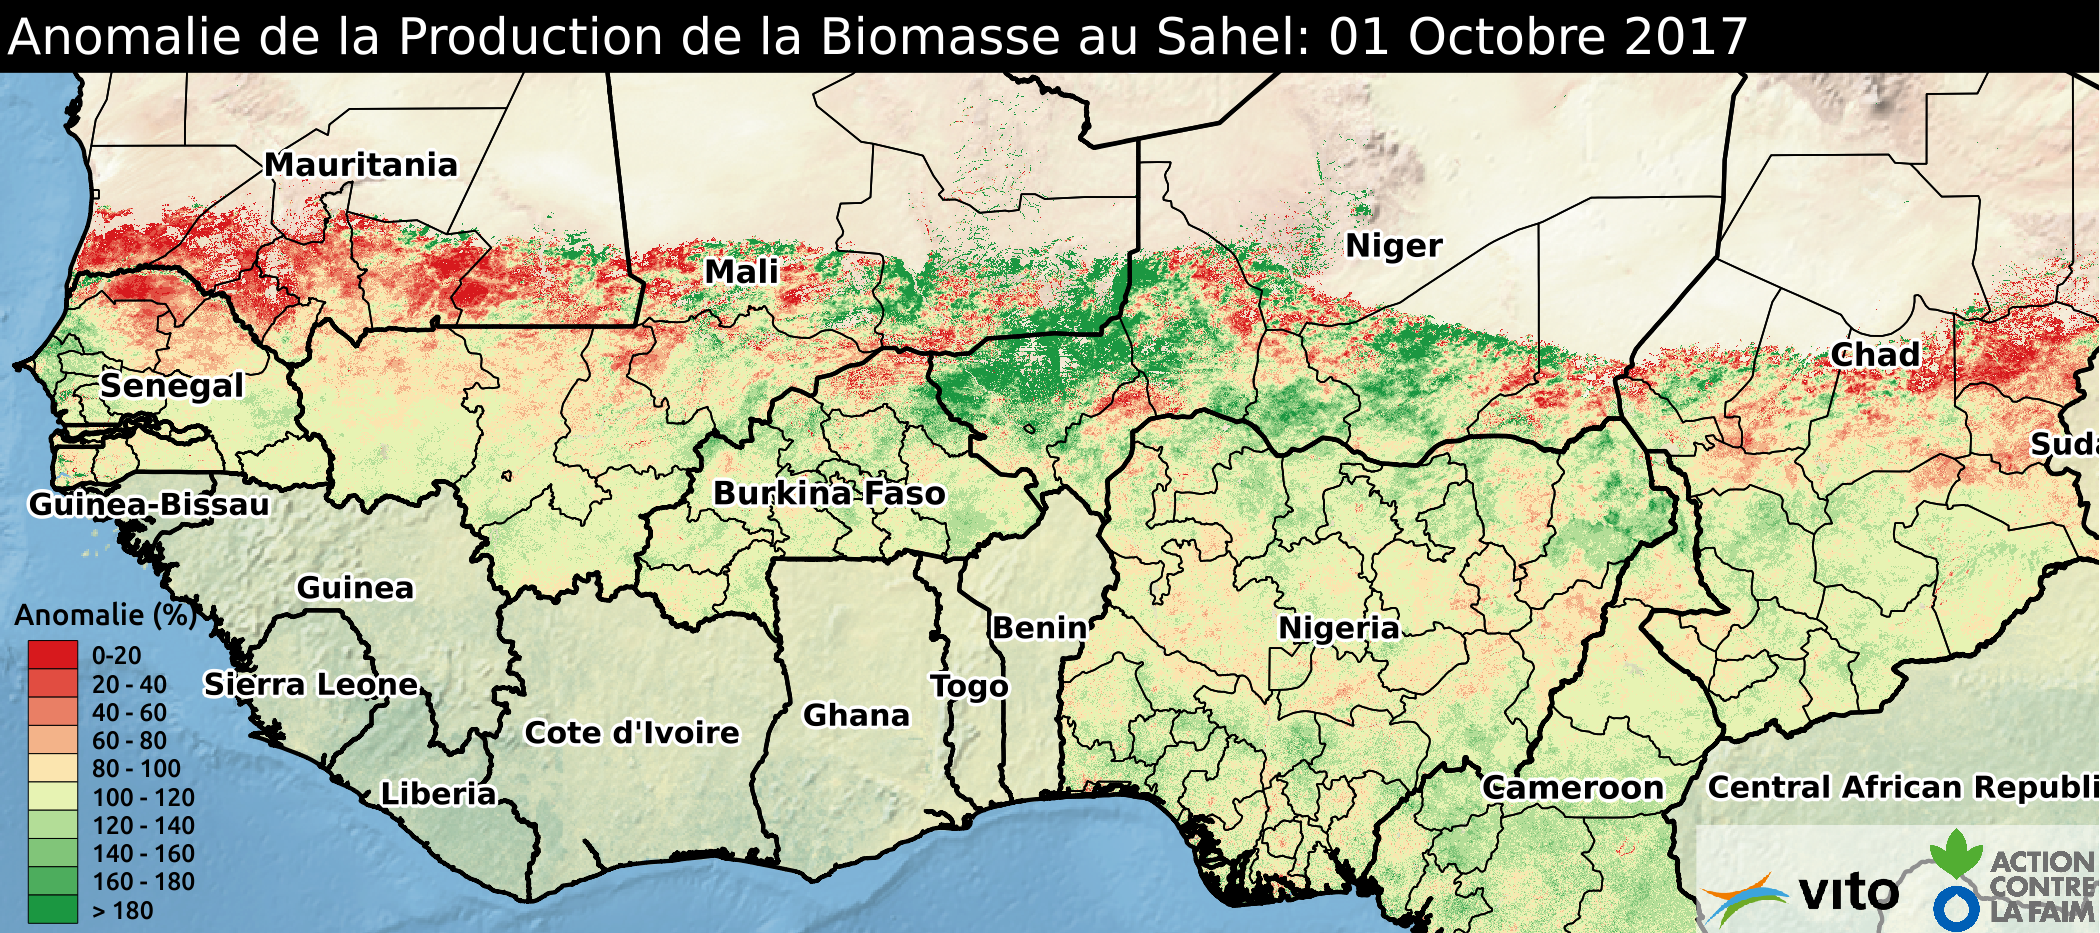 Anomalie_Sahel_2017_lowres.png